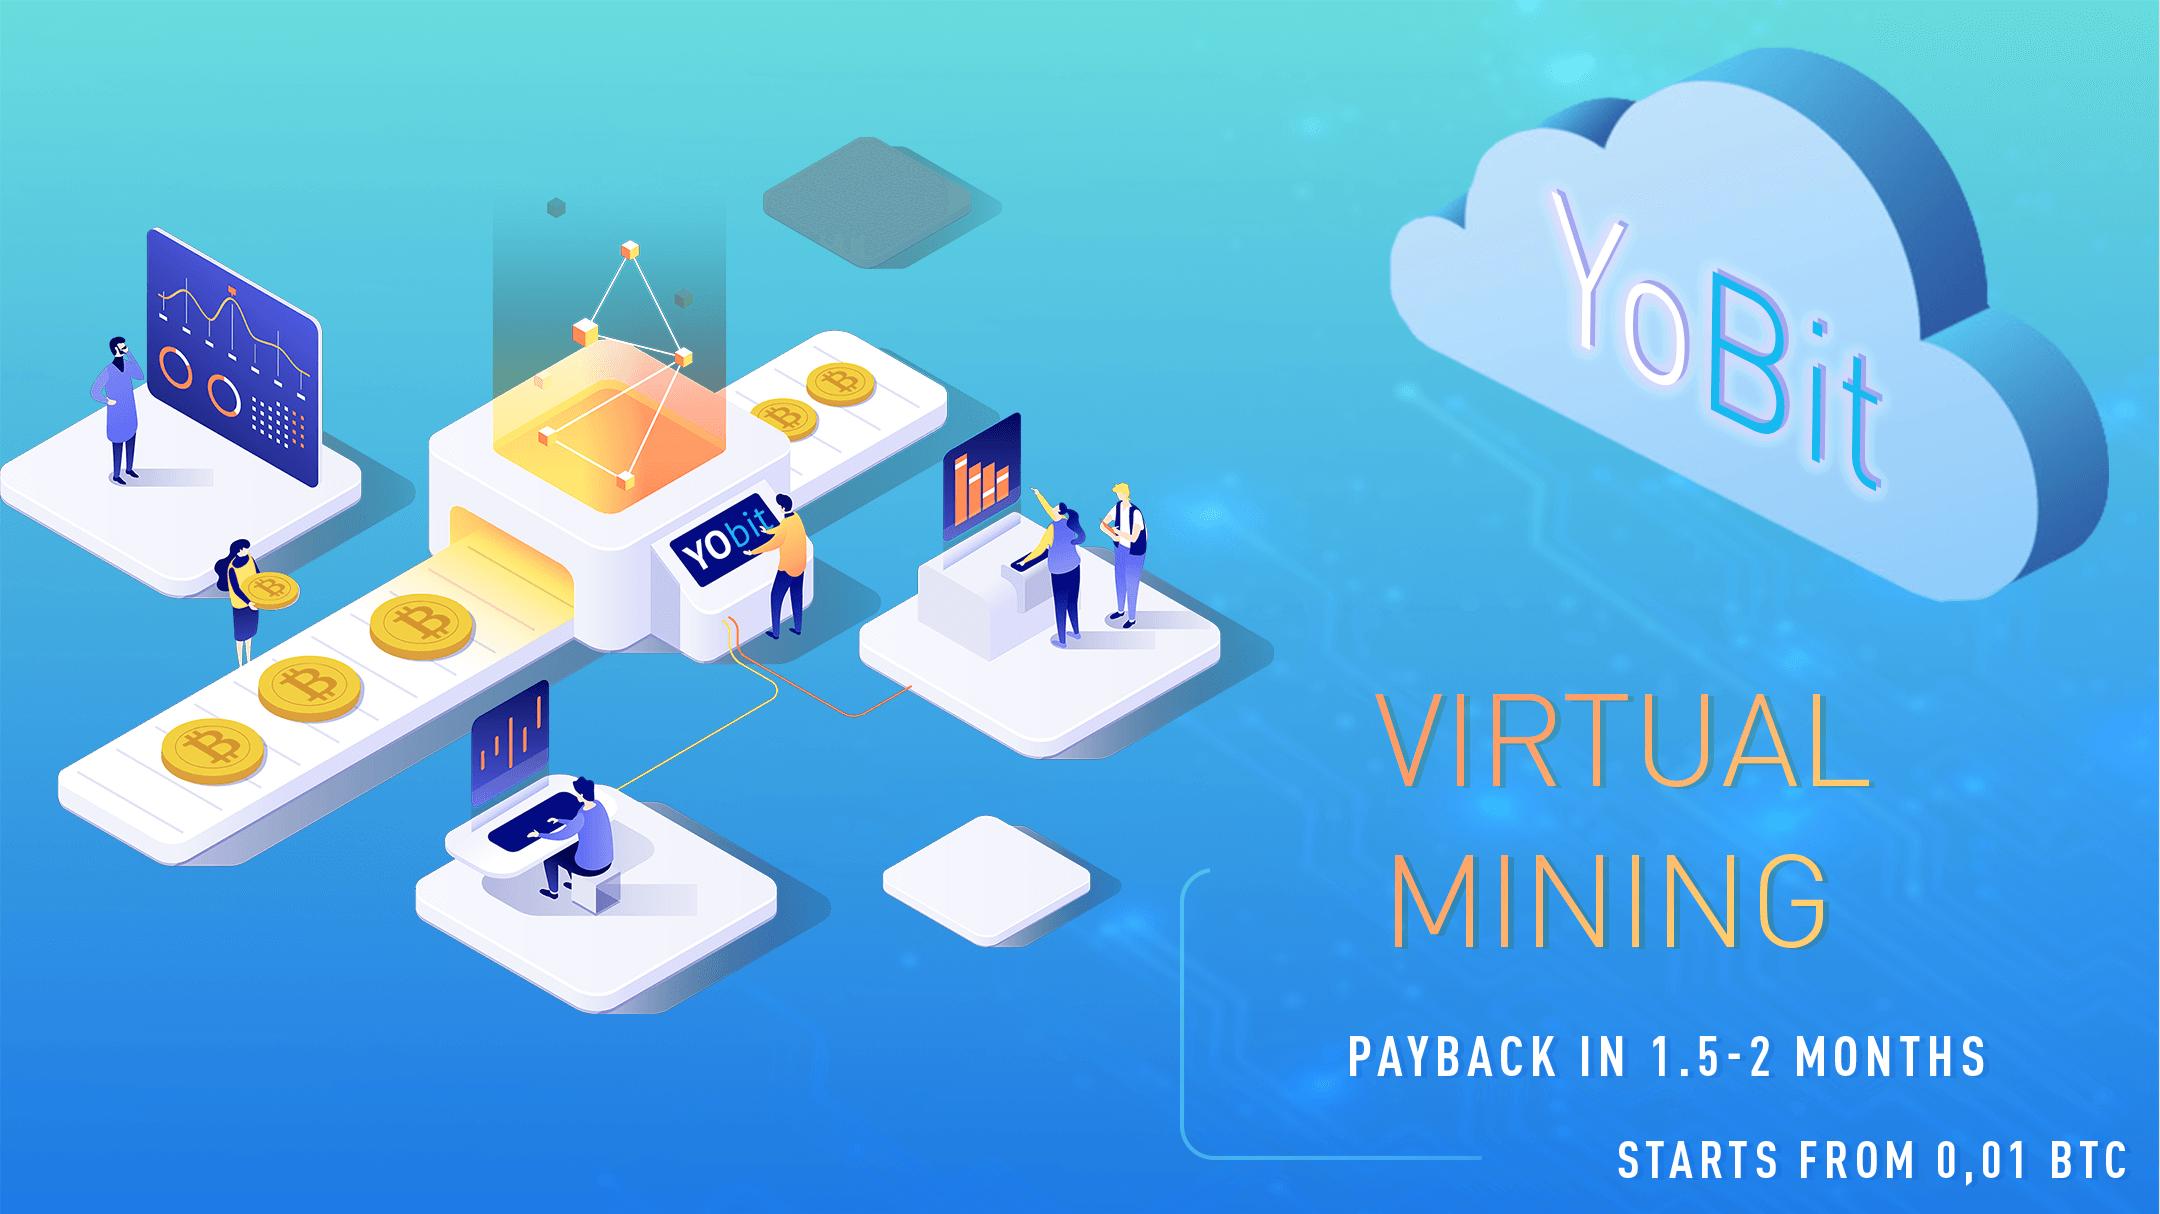 YoBit Virtual Mining